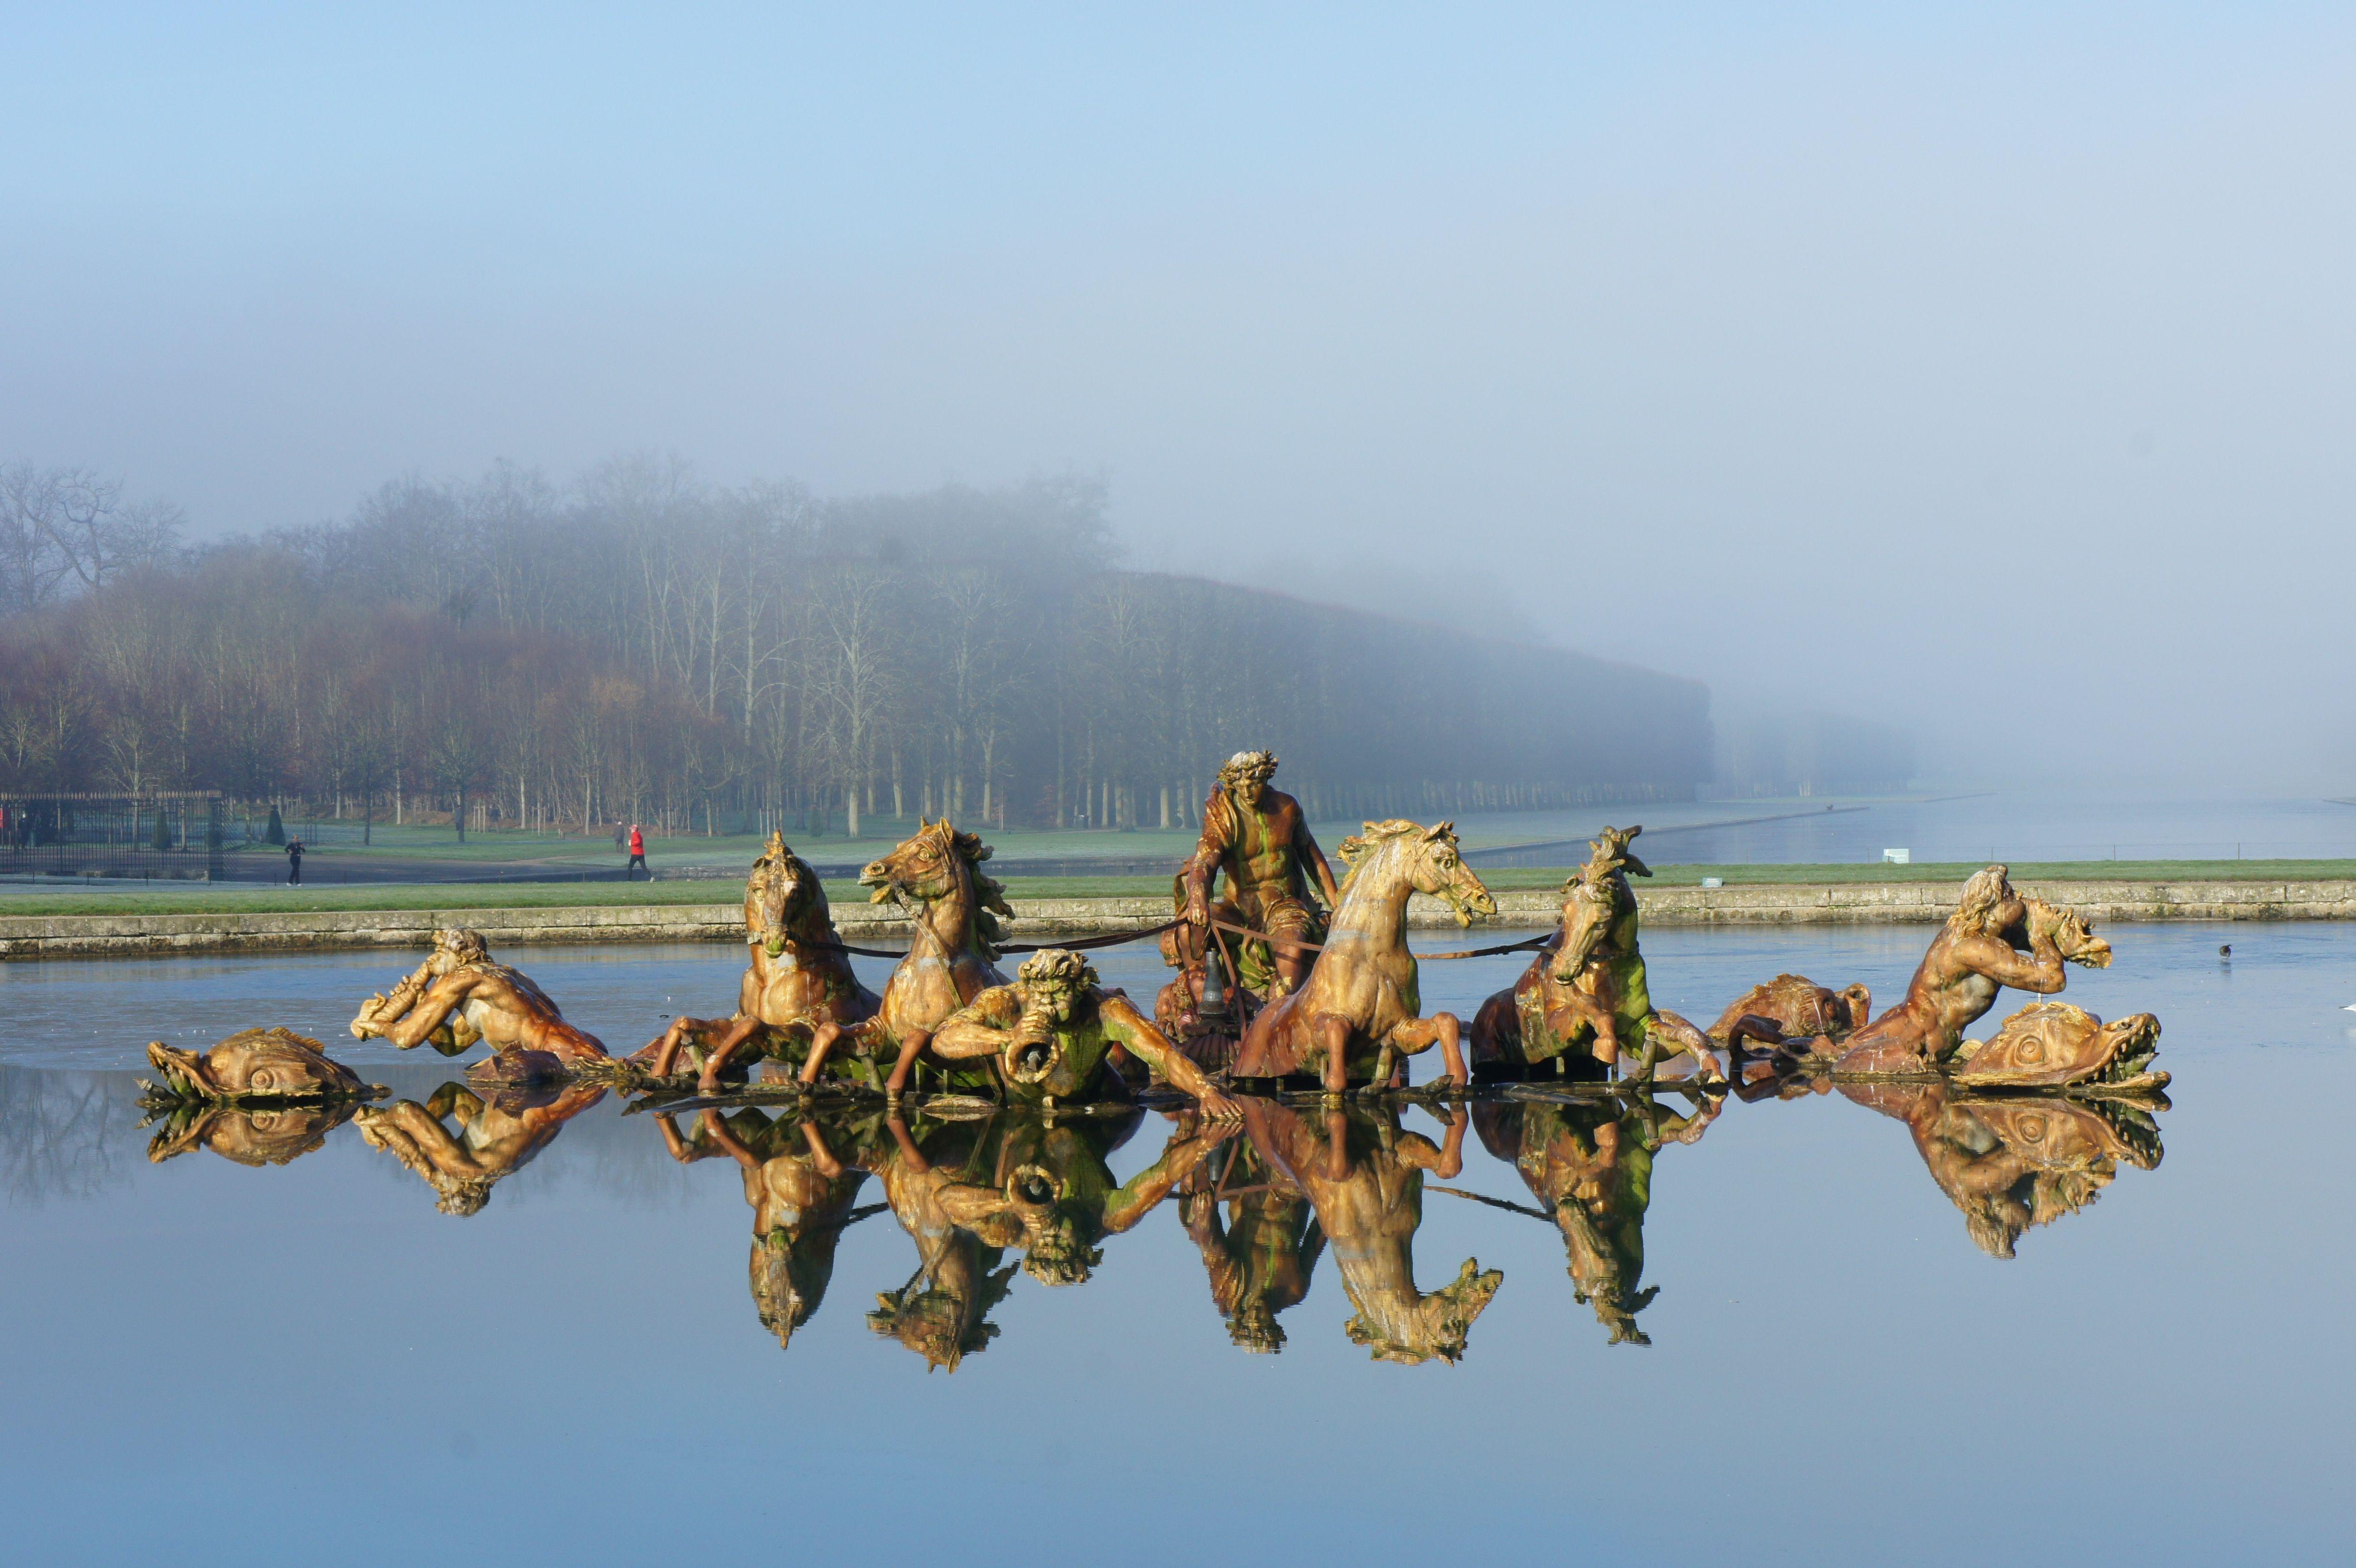 Garden of Versailles on a misty morning.